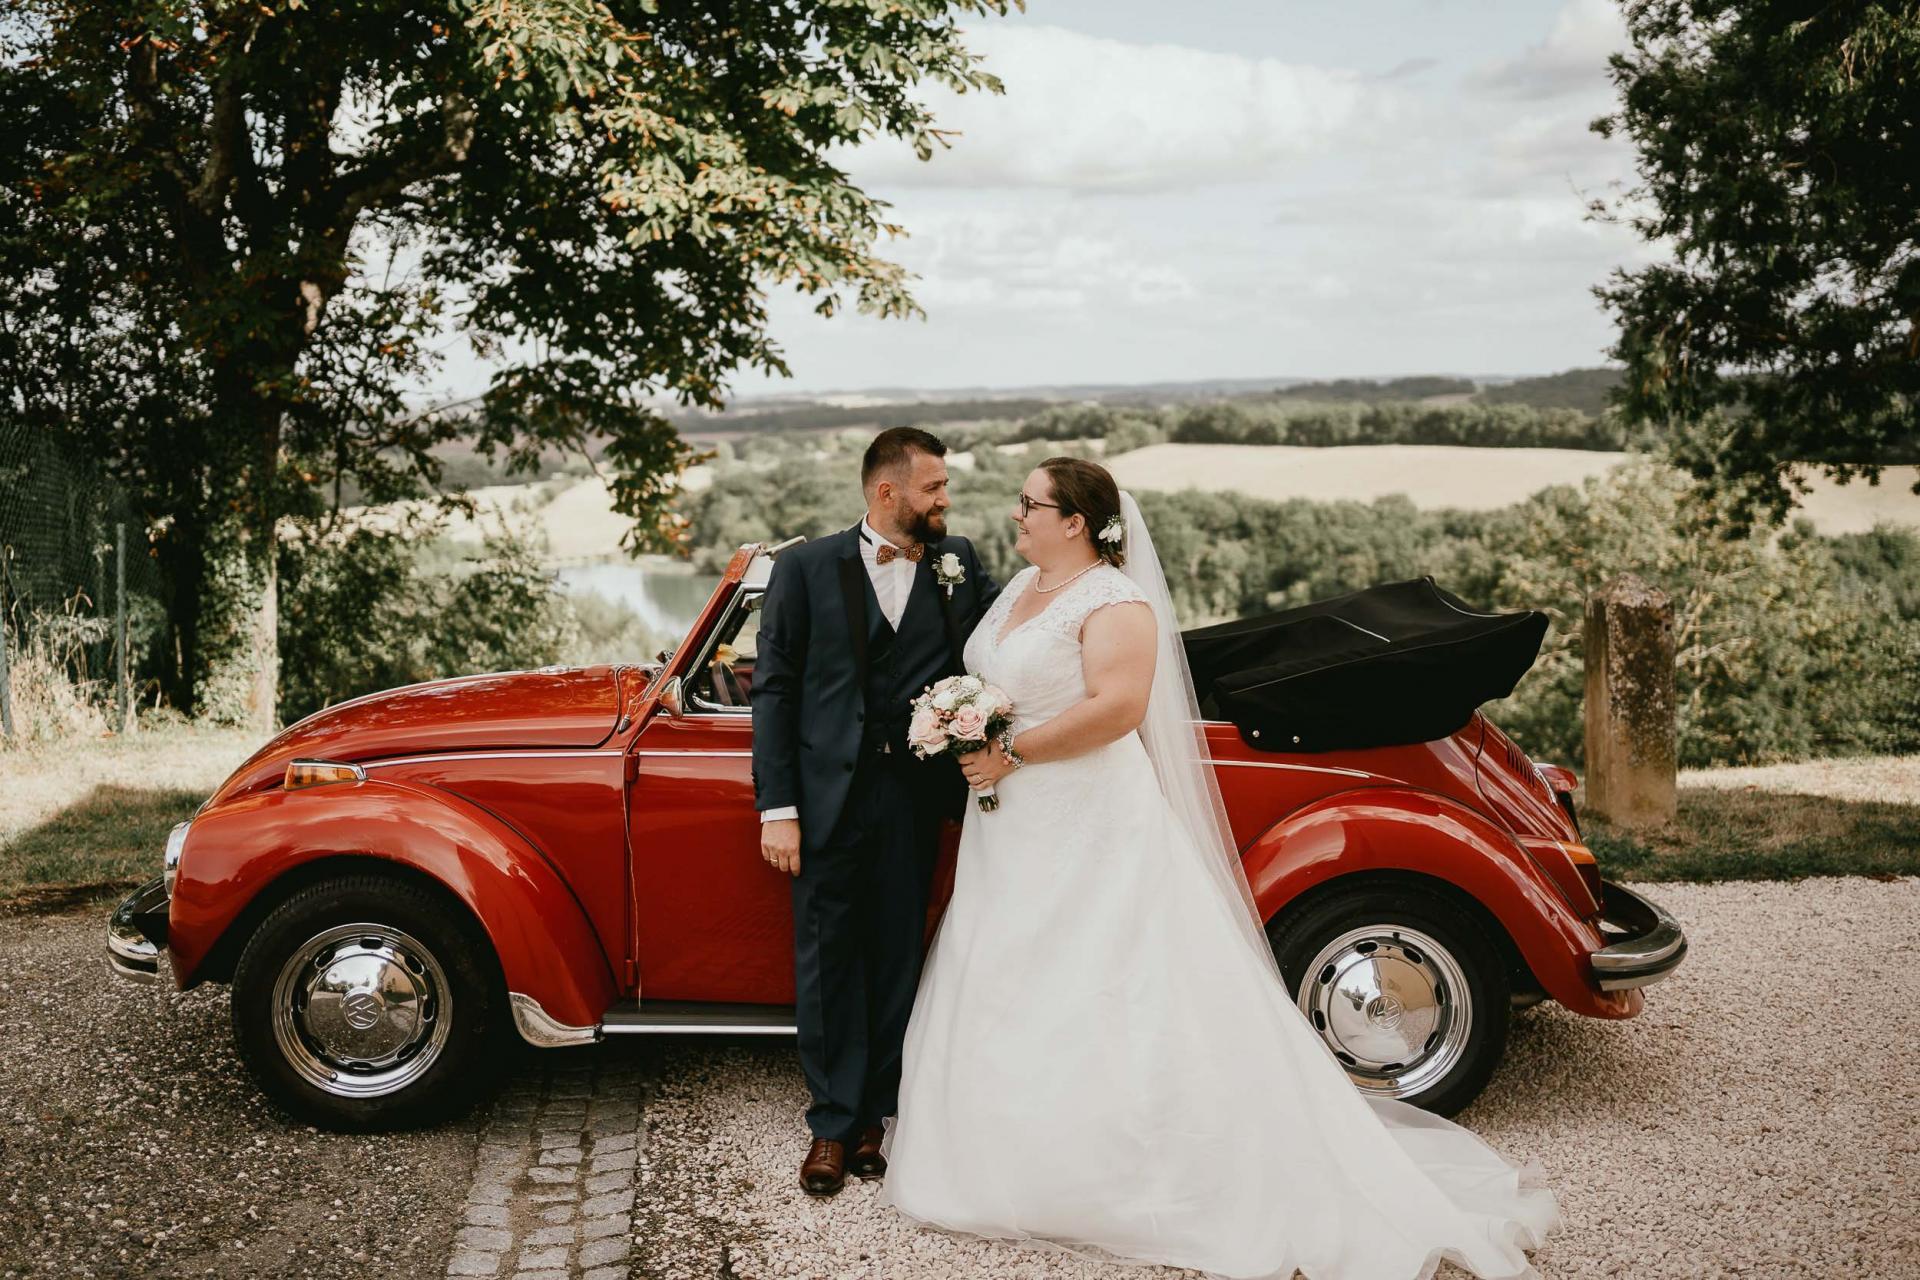 Photographe de mariage moody boho chic boheme dax landes aquitaine fineart 38